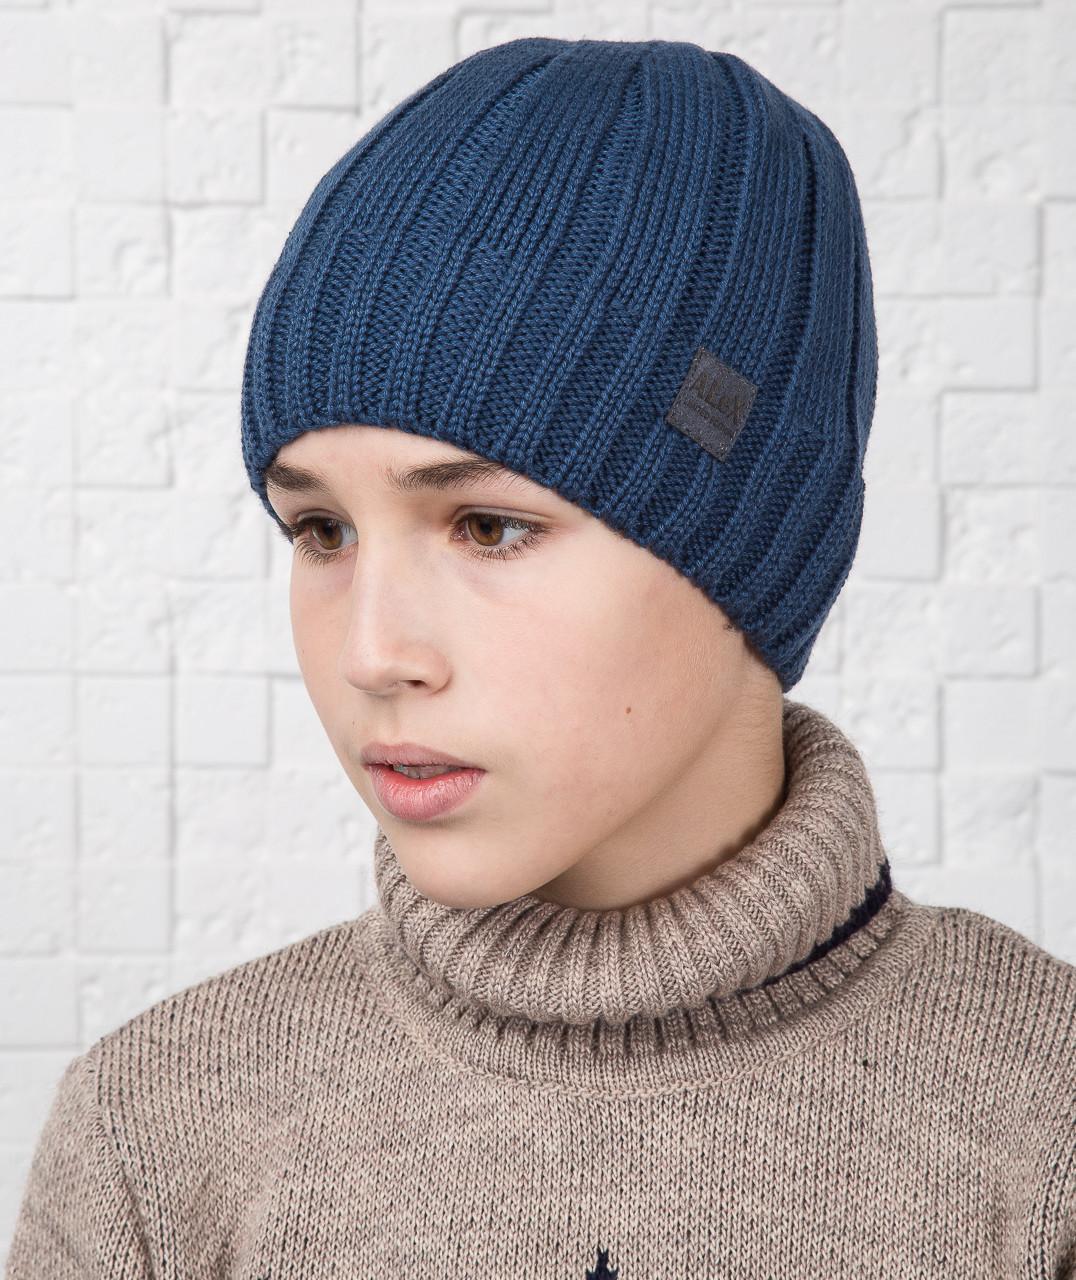 Зимняя вязаная шапка для мальчика подростка зима 2018 - Артикул AL17041